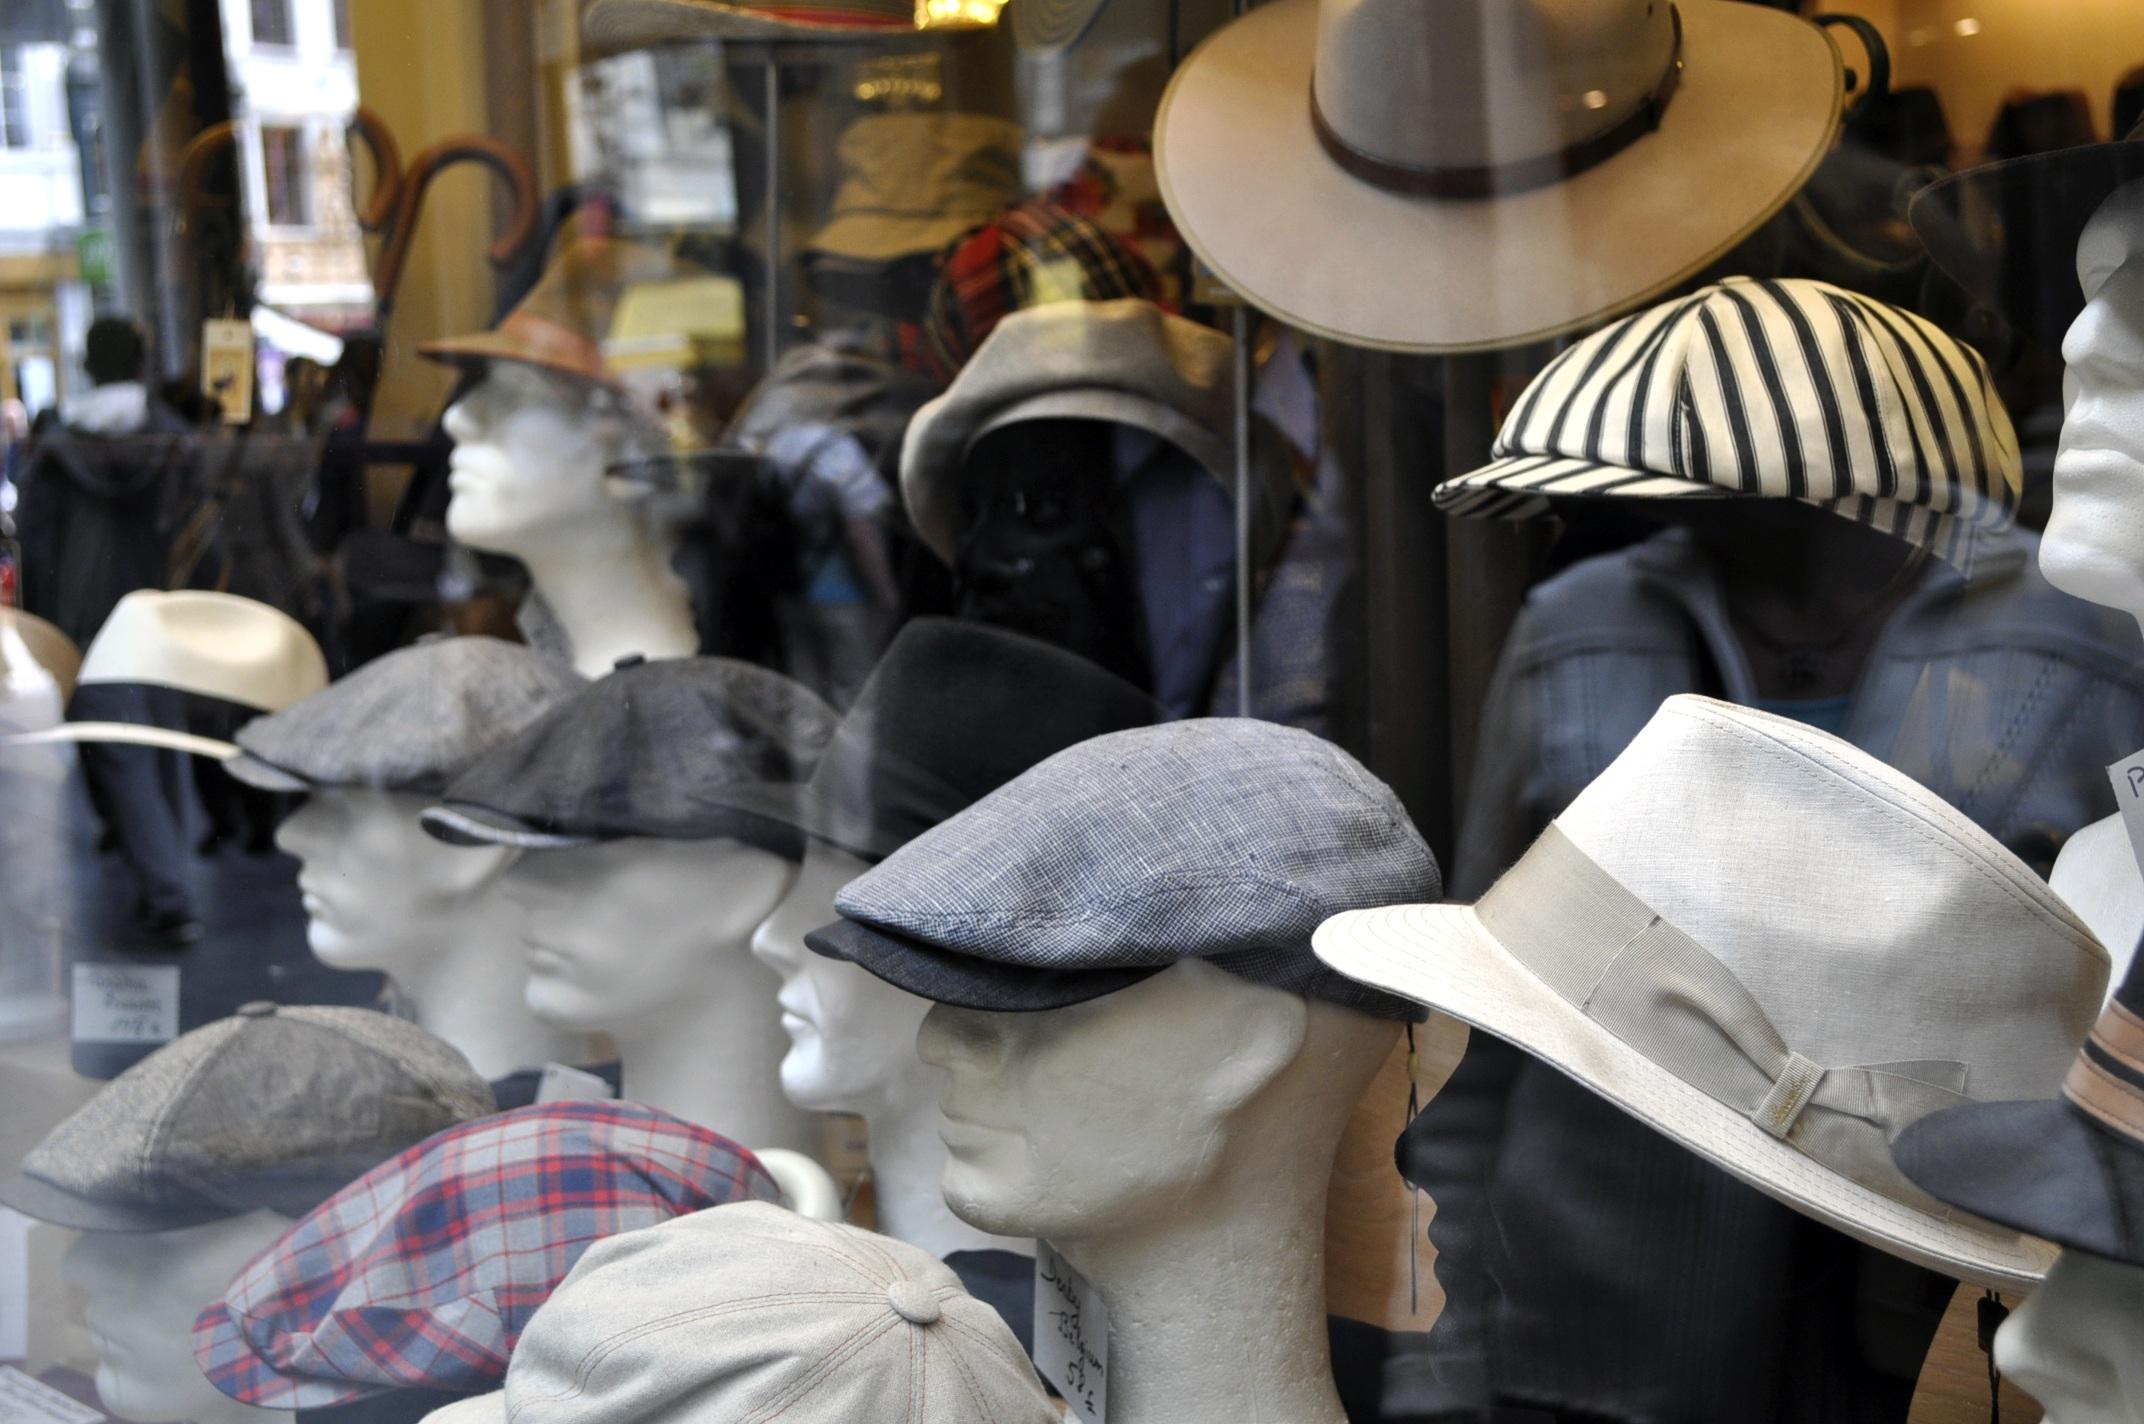 1b24dfdcf3331 window city crowd store hat fashion market clothing shopping lifestyle shop  window men brussels berret